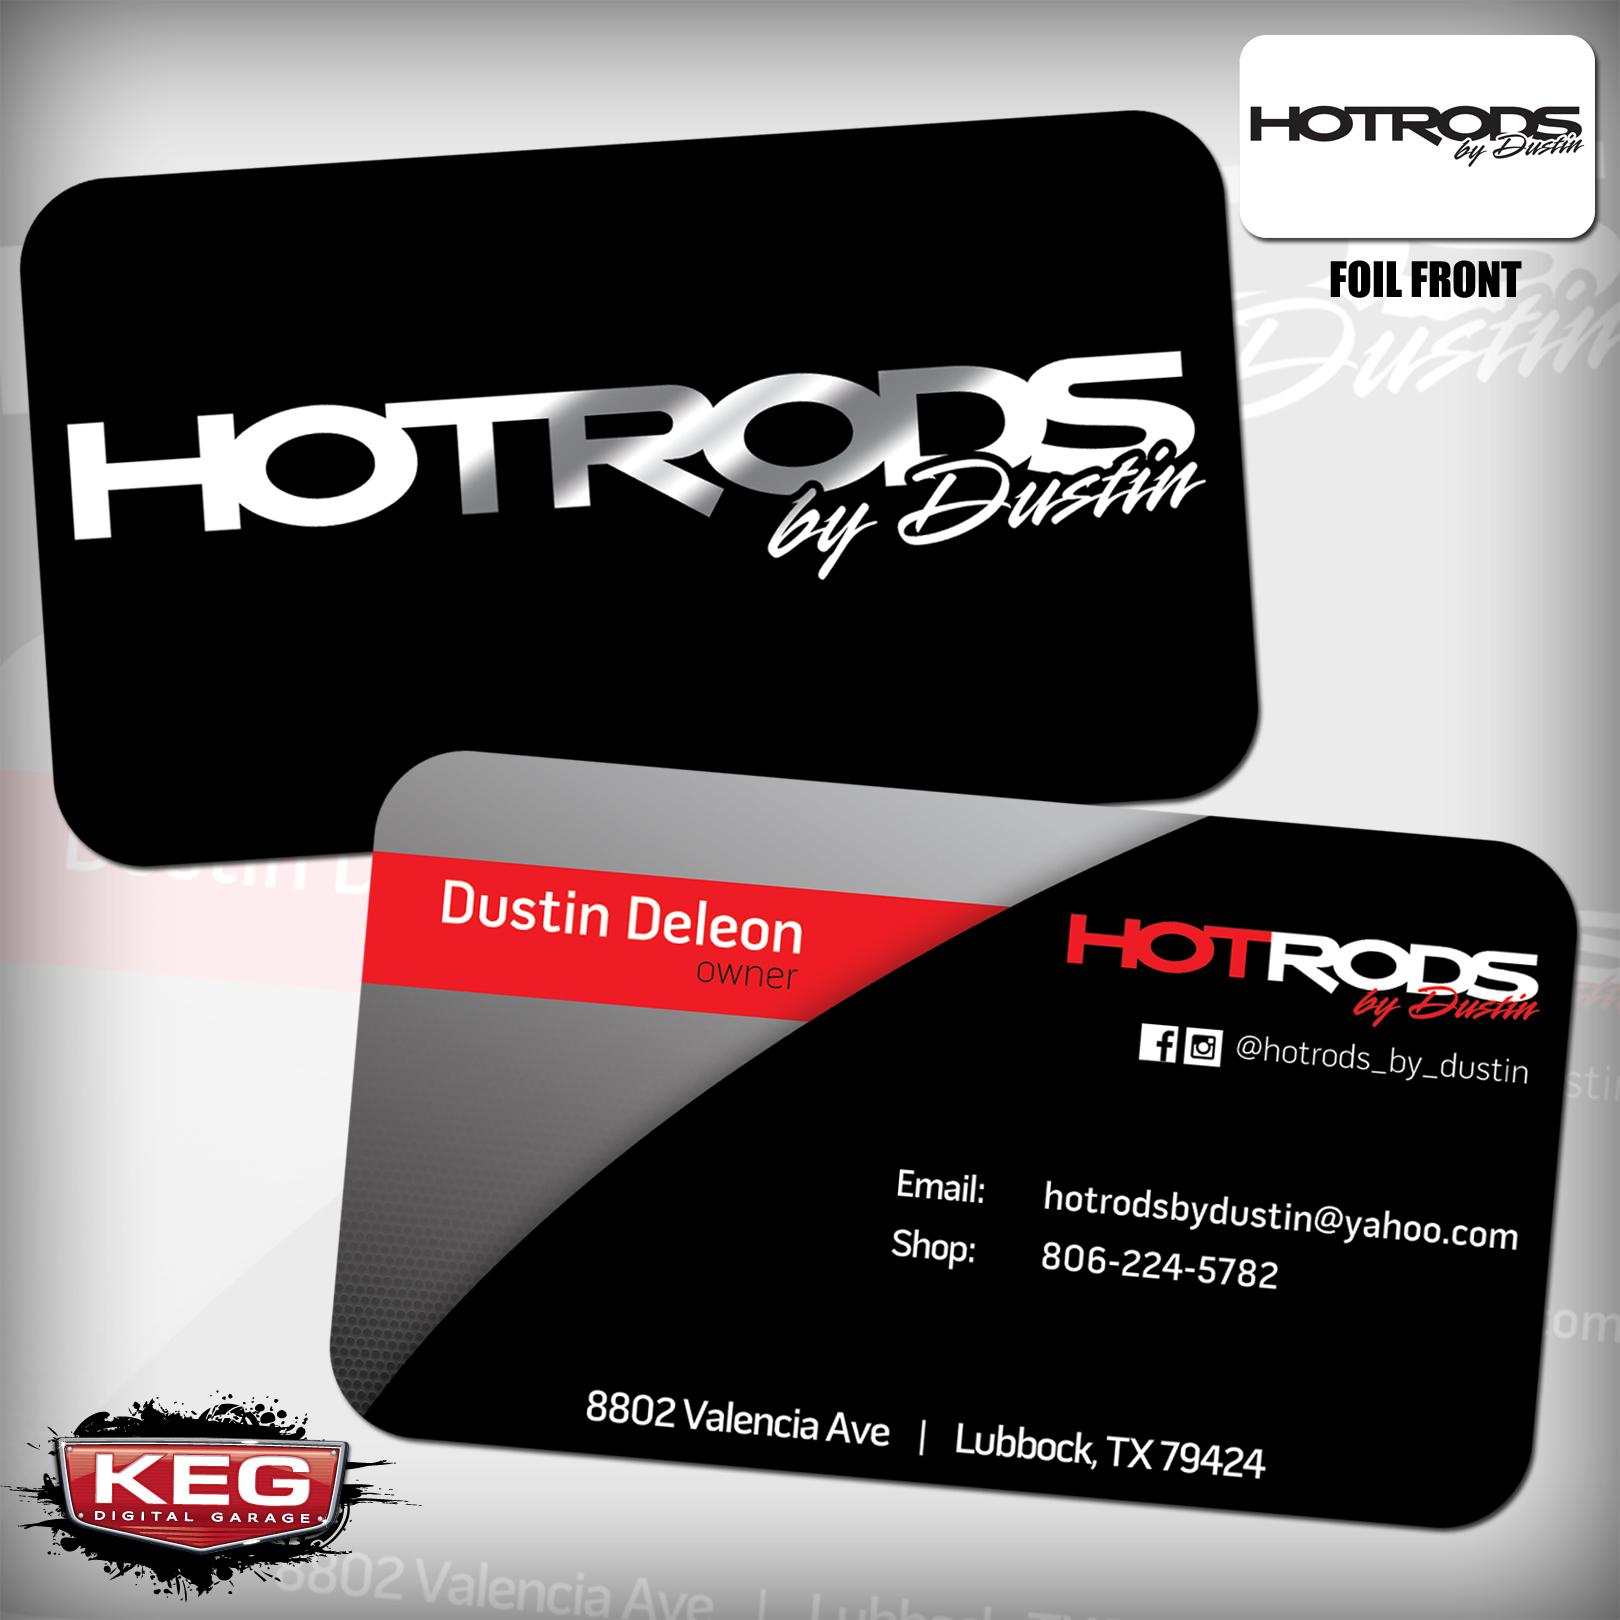 Business Cards - KEG Media